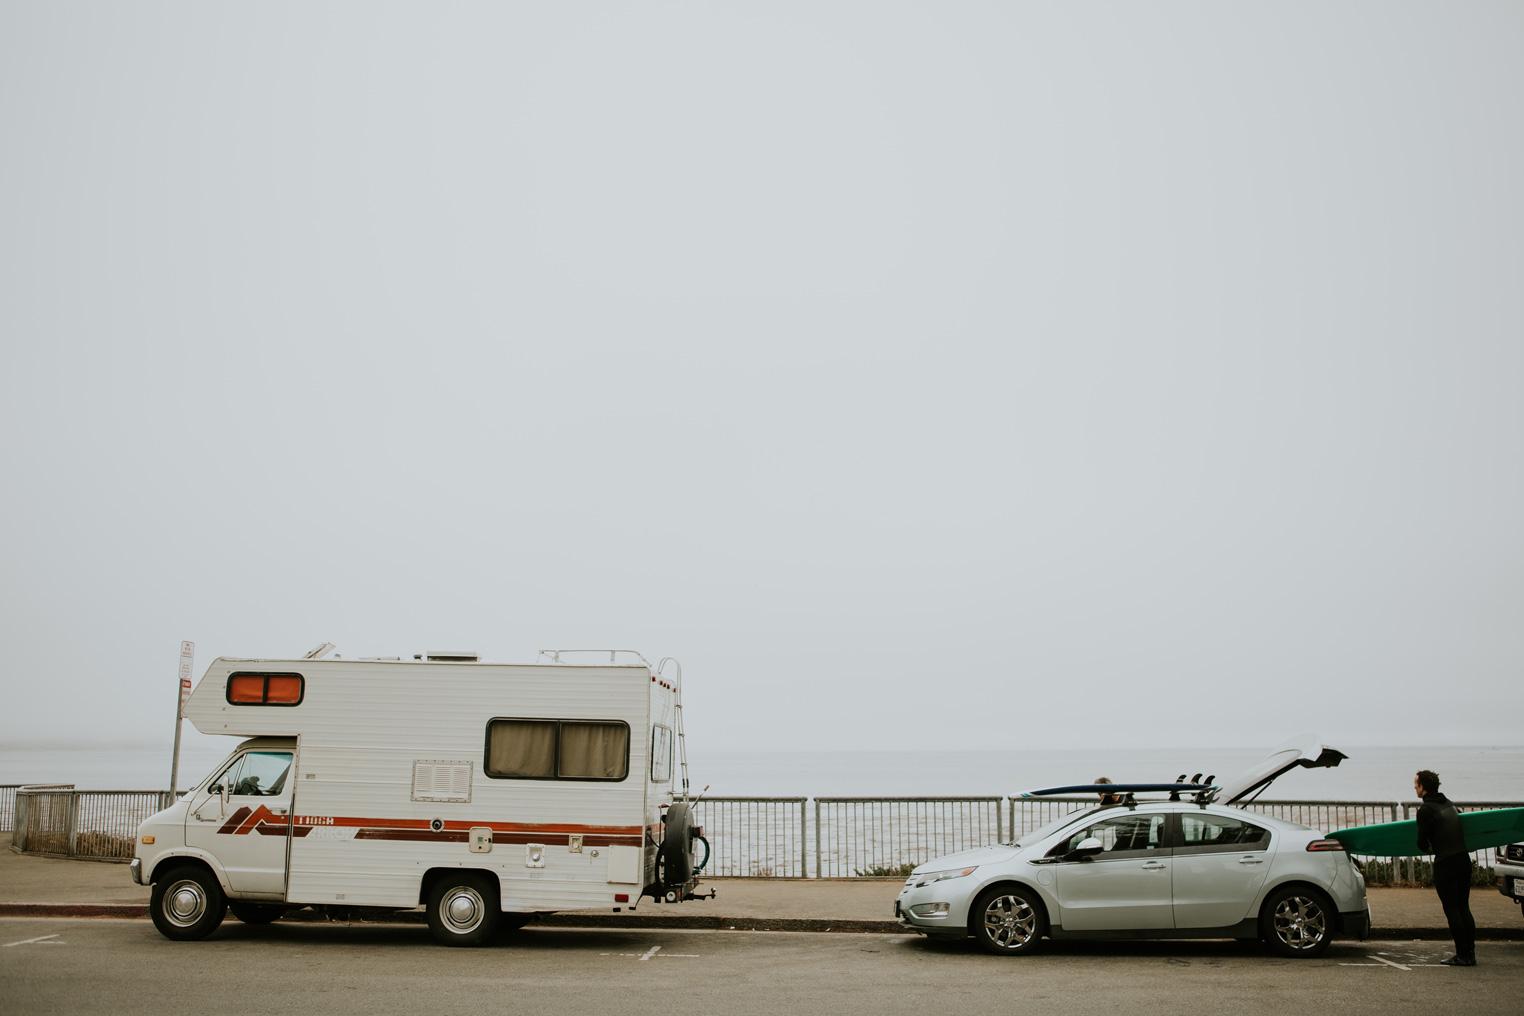 CindyGiovagnoli_SantCruz_SanJose_SanFrancisco_NelderGrove_sea_lions_boardwalk_hapas_brewery_sourdough_ocean_half_moon_bay_California-073.jpg